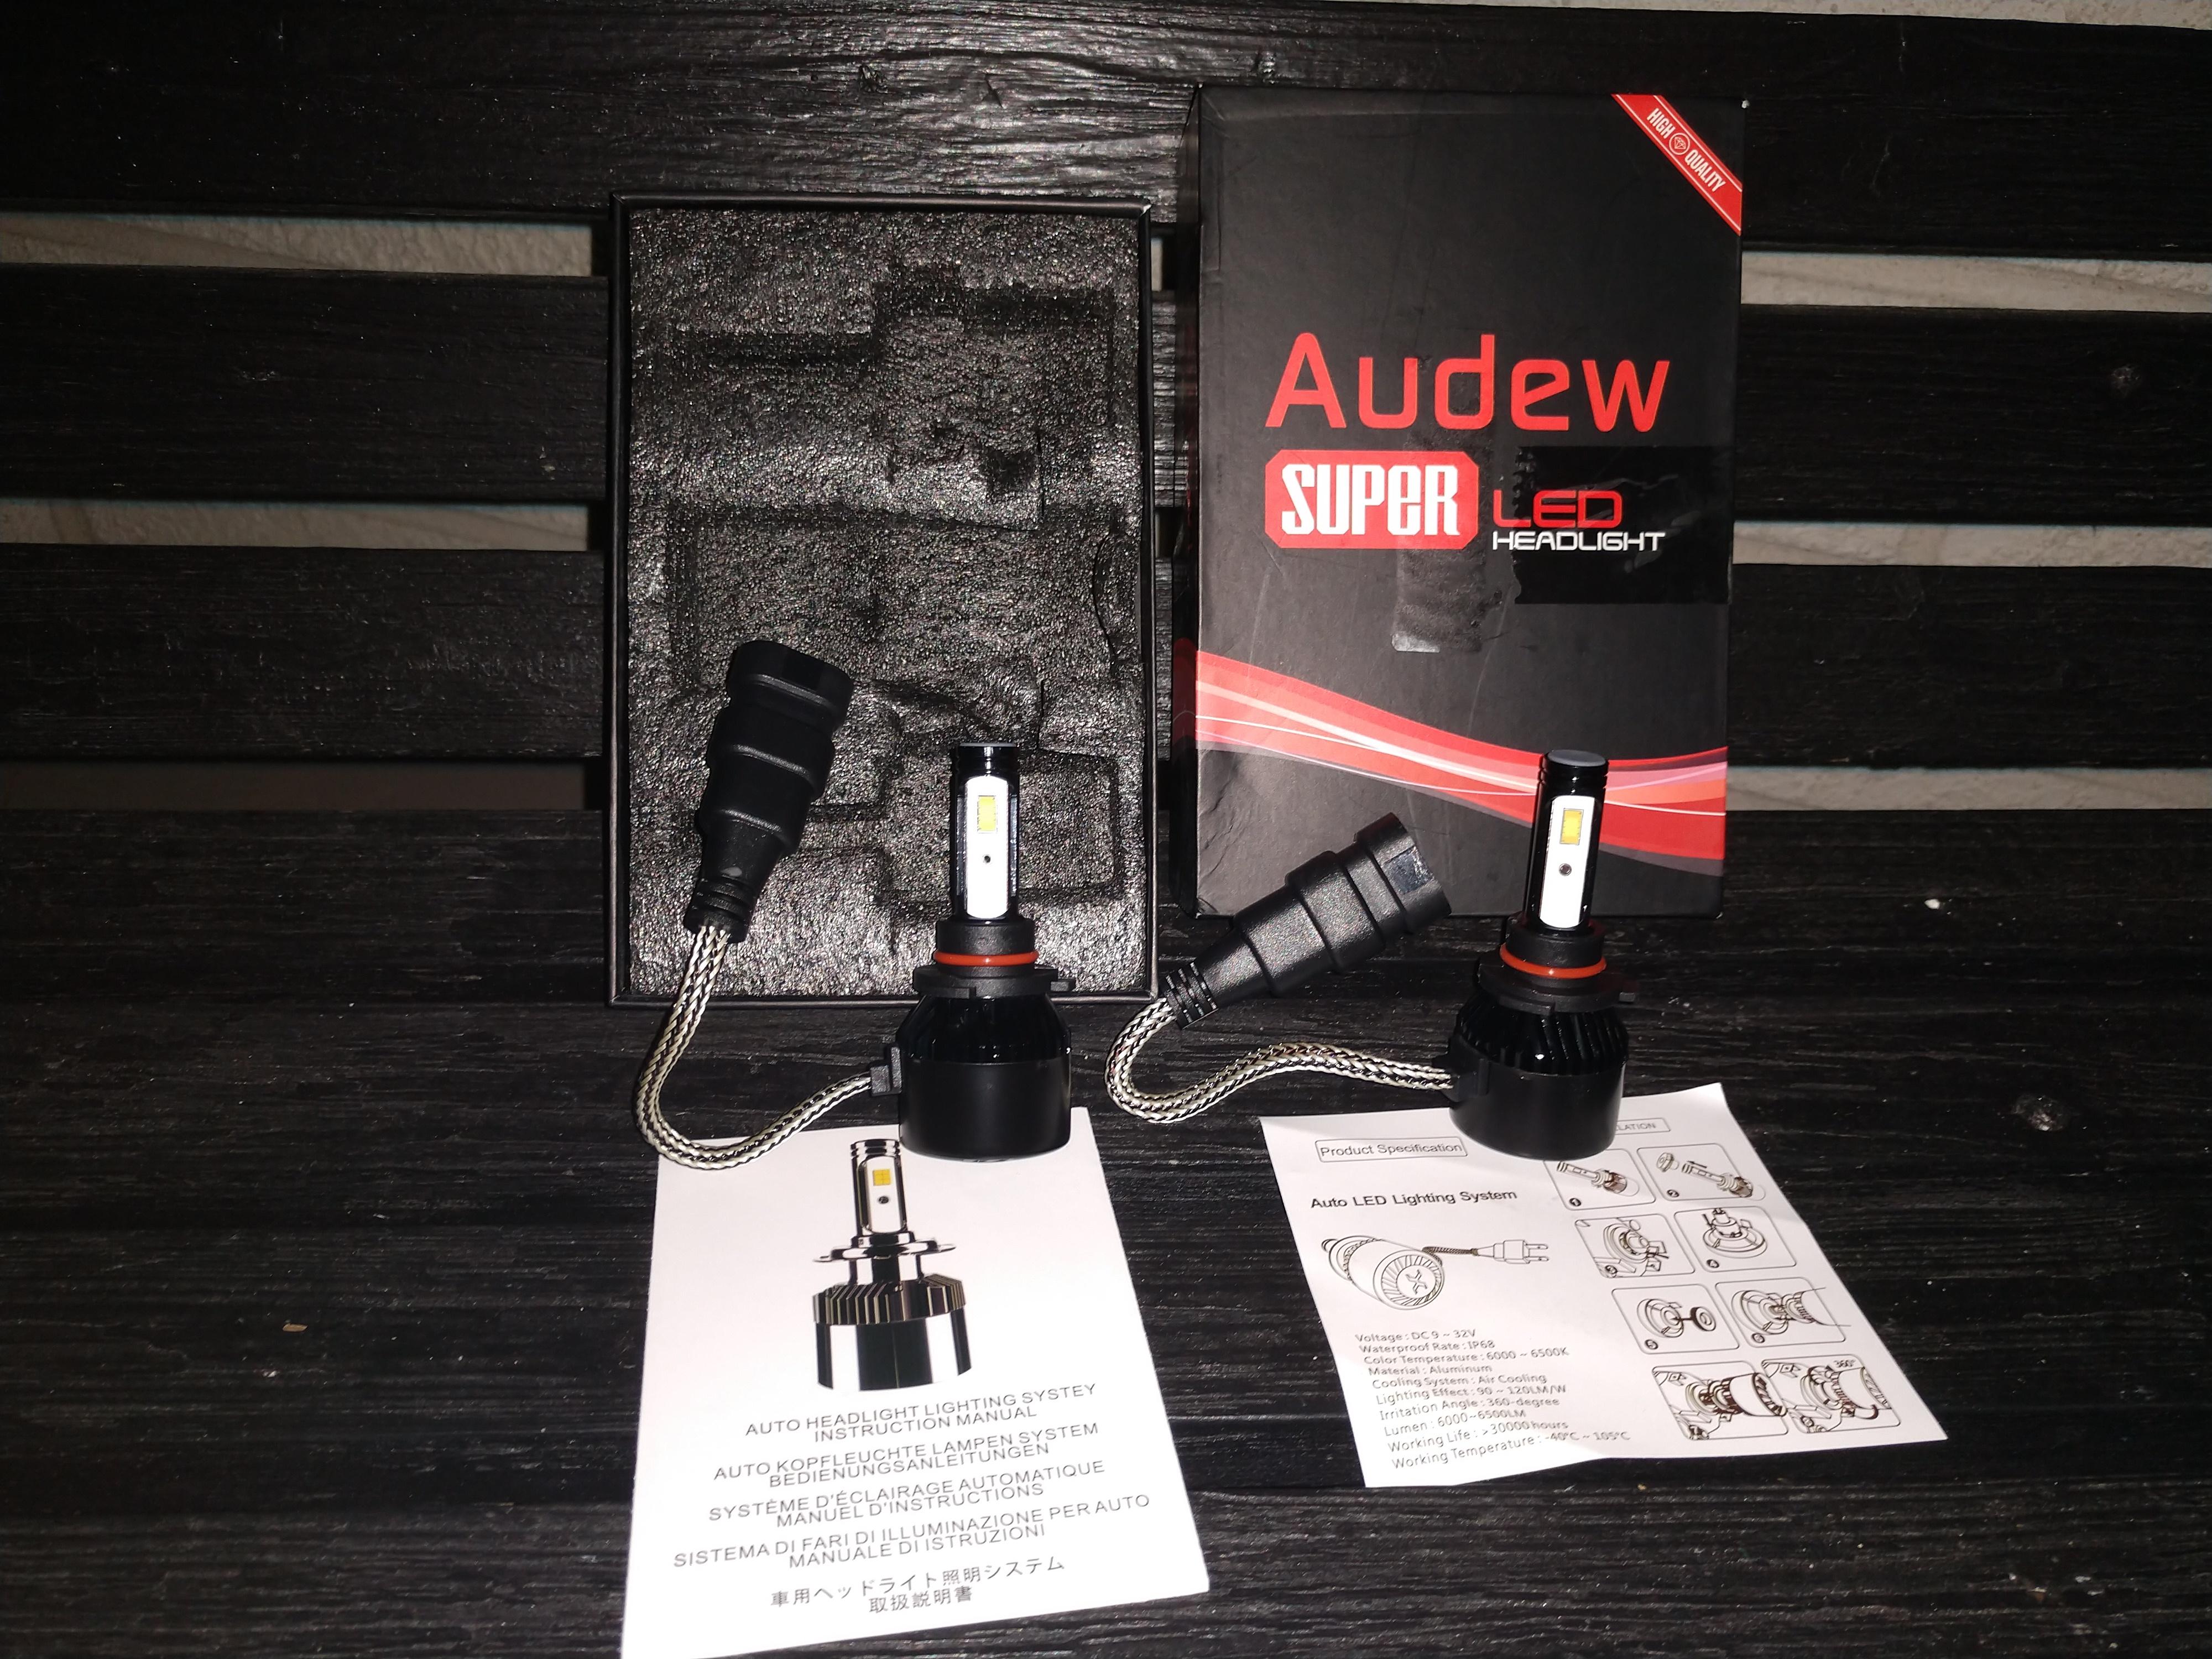 Audew led headlight kit review that s it guys